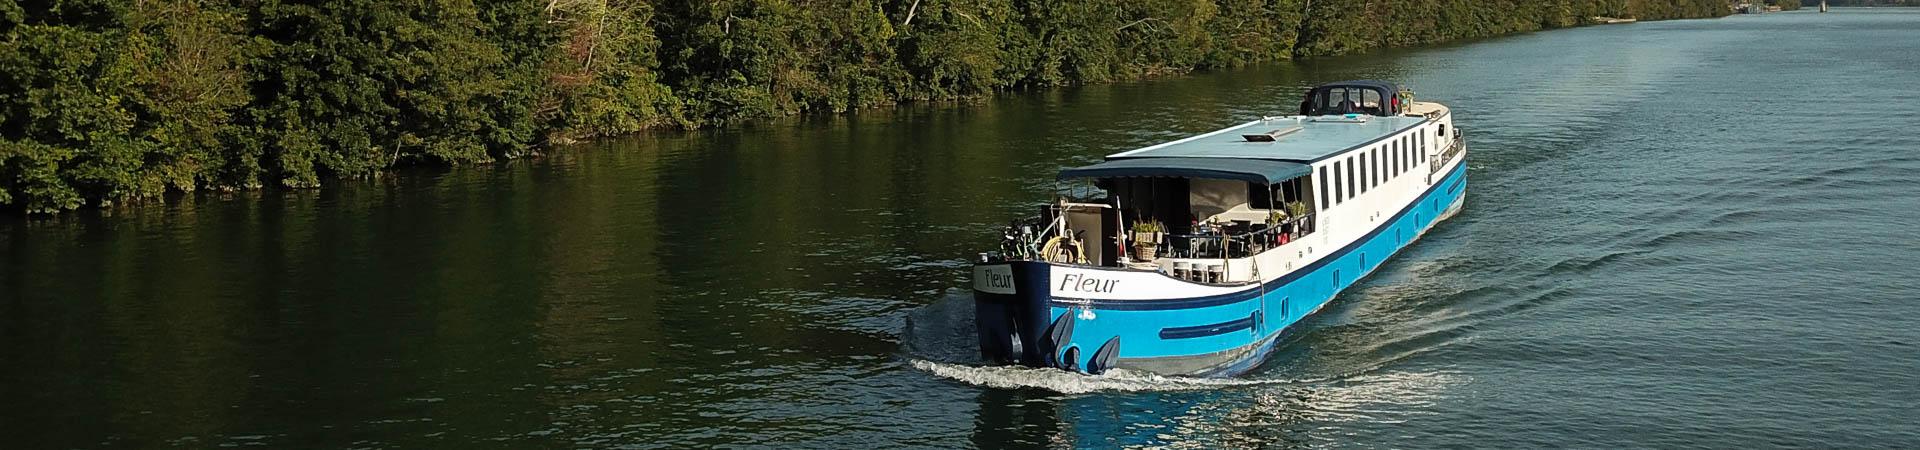 Barge Fleur Seine